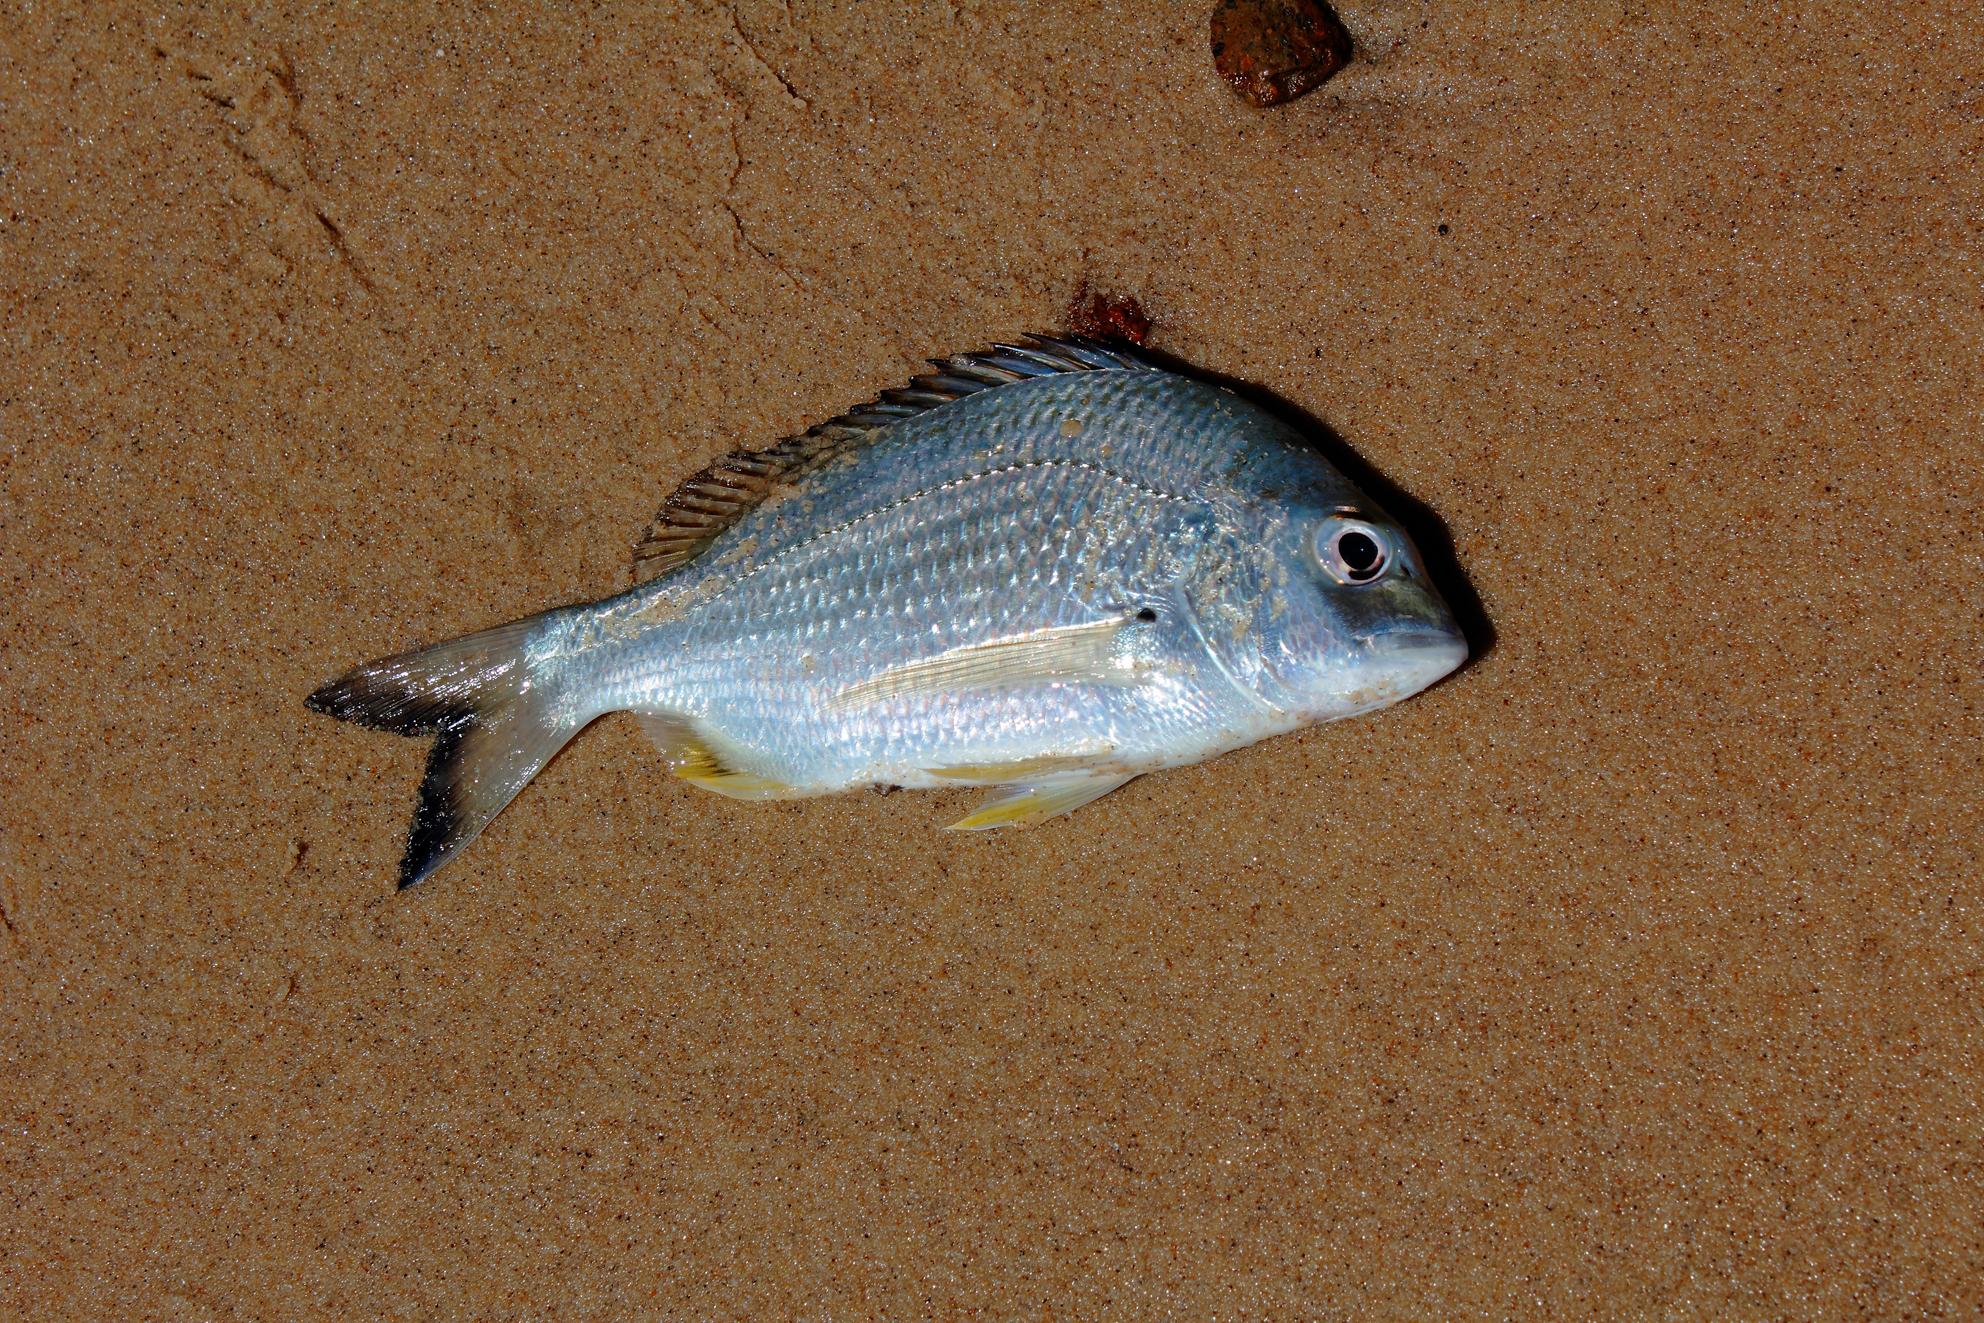 Dead fish on beach photo